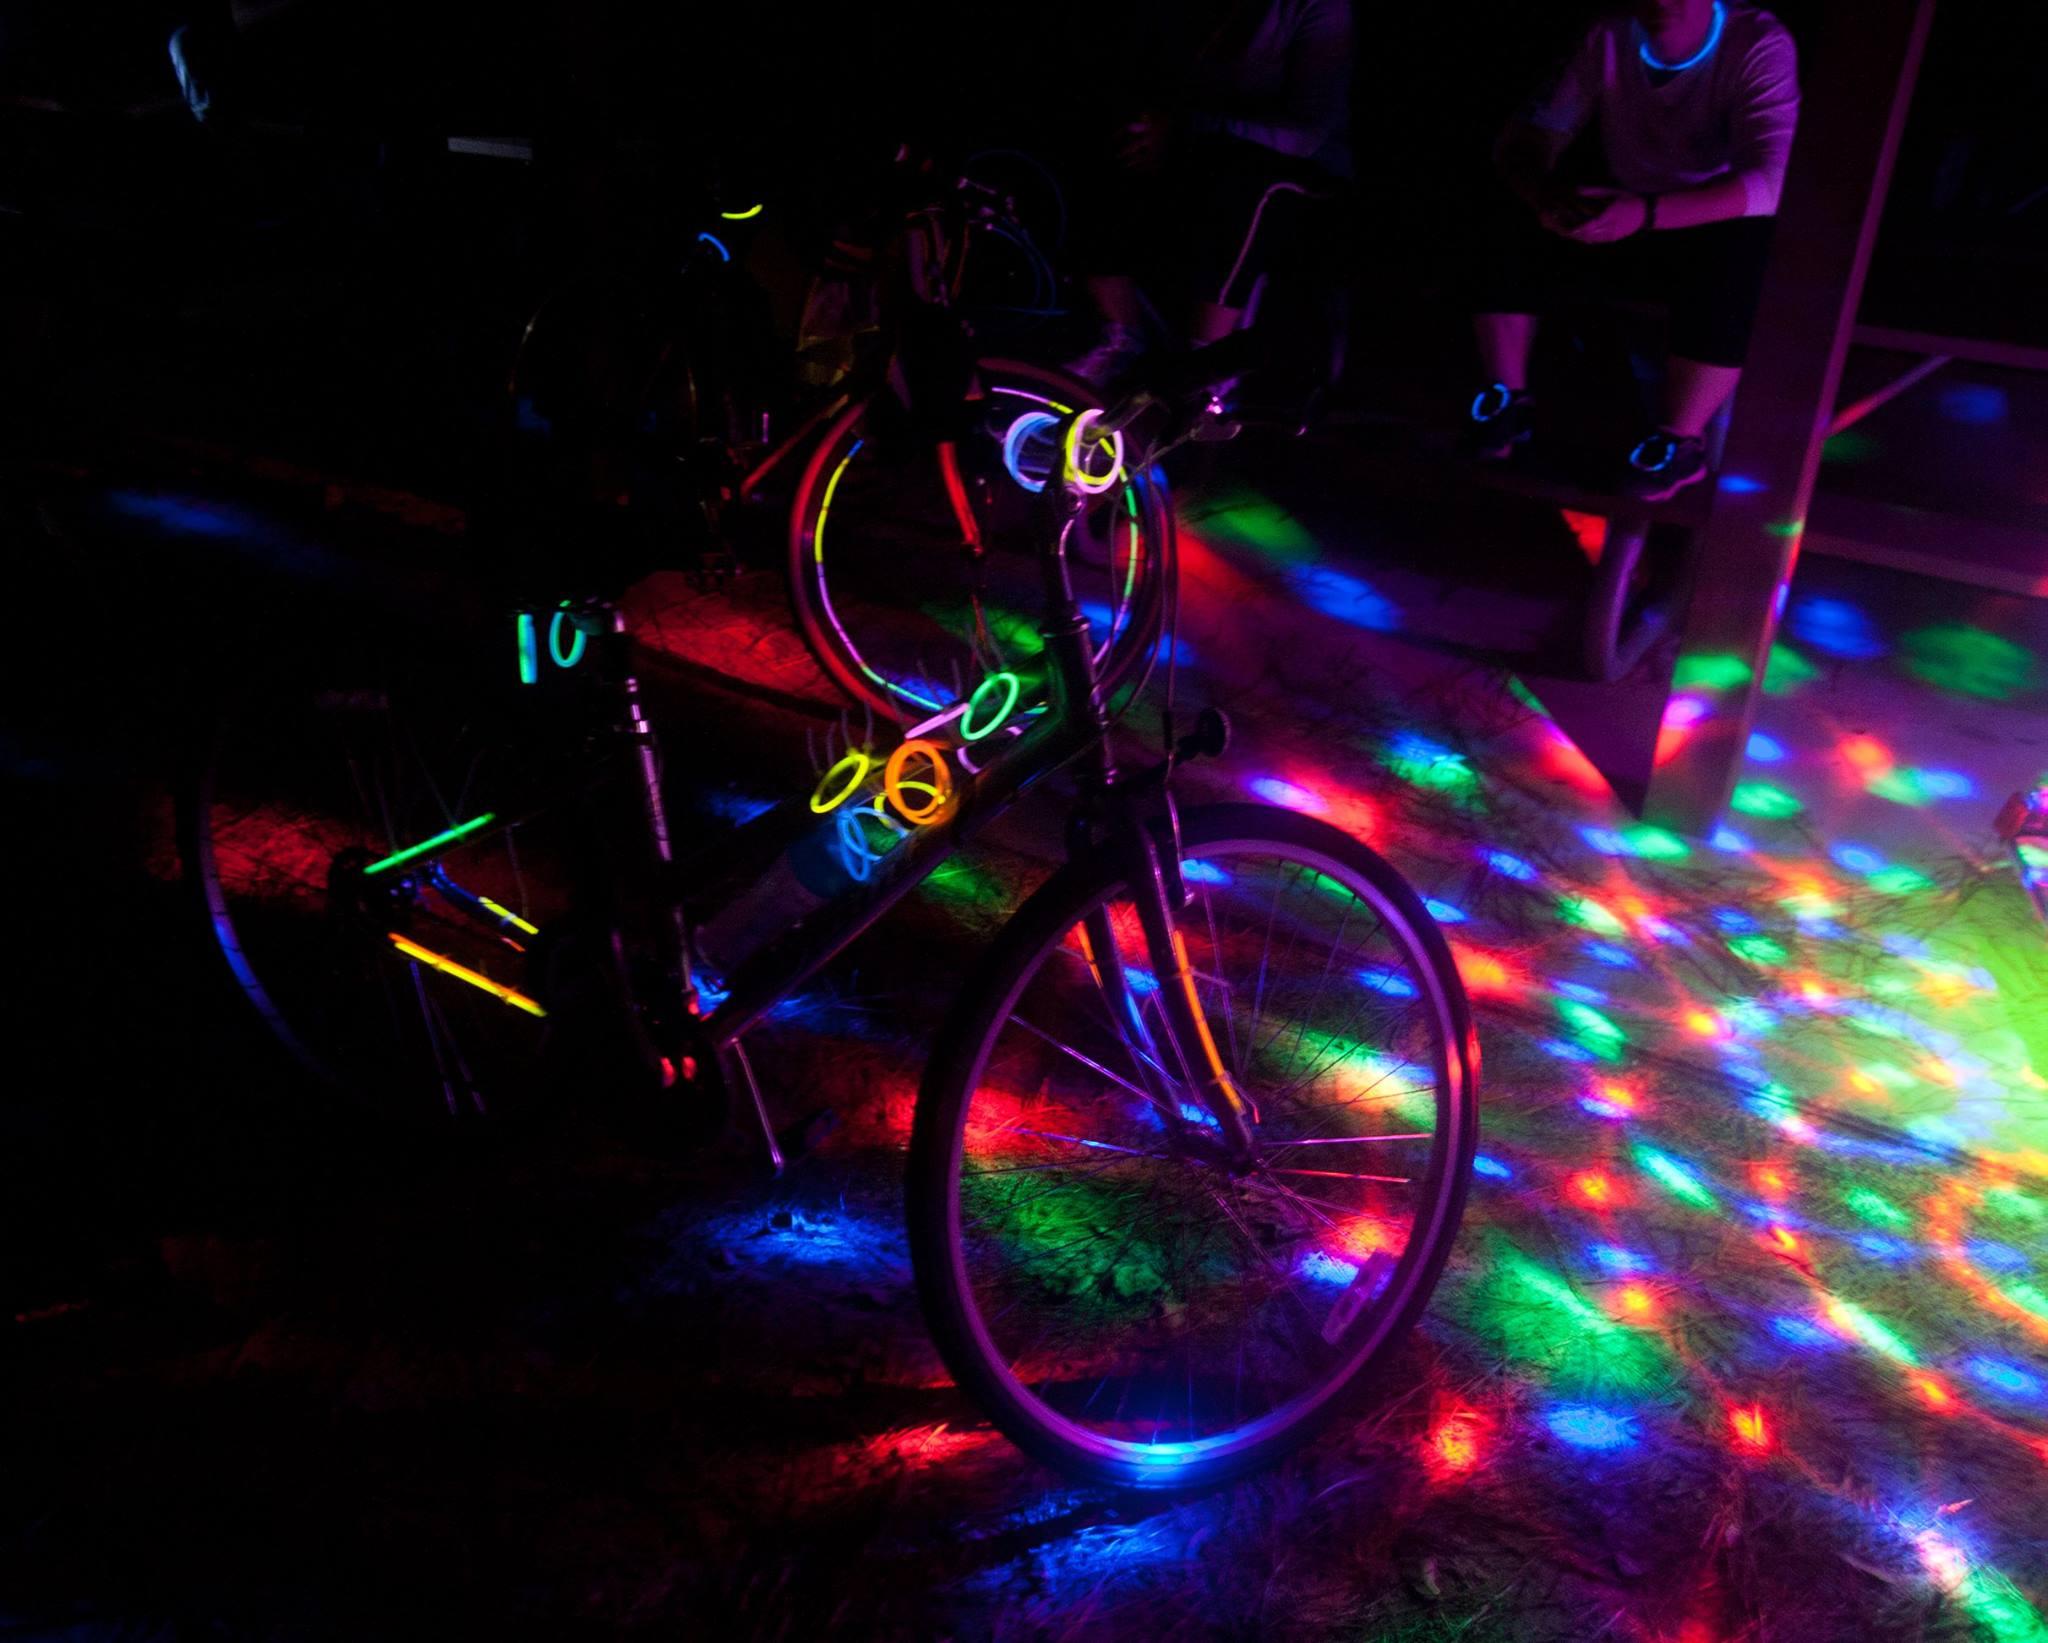 Salisbury Jaycees Christmas Parade 2021 Salisbury Christmas Parade Mayor Day Salisbury Bike Party Downtown Salisbury Md